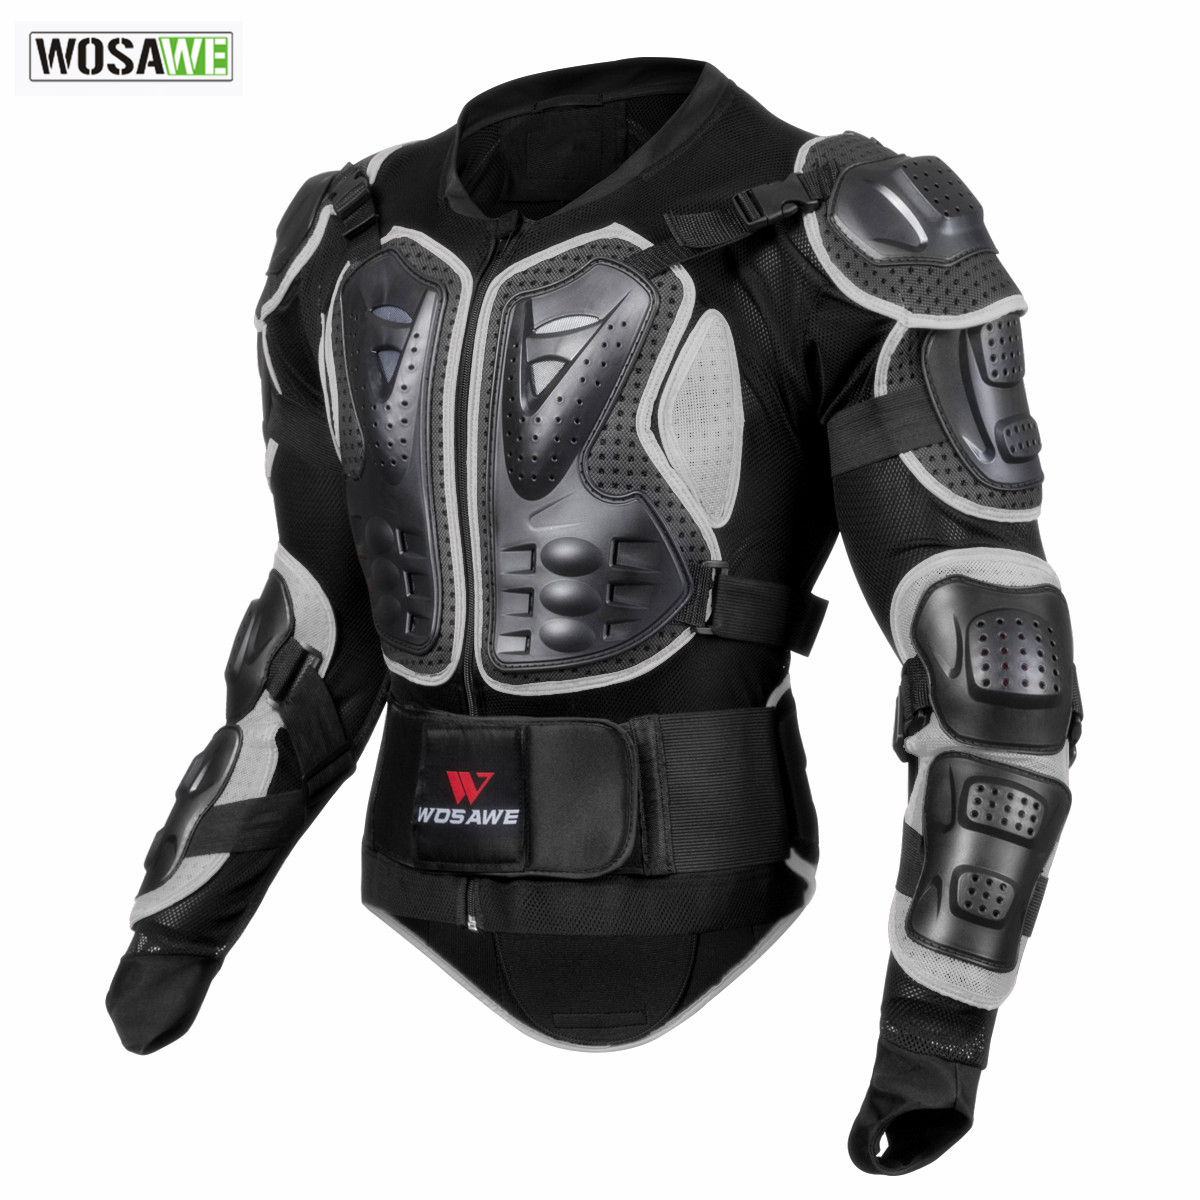 WOSAWE Moto armure veste Protection du corps Moto tortue course Moto Cross Back Support bras protecteur